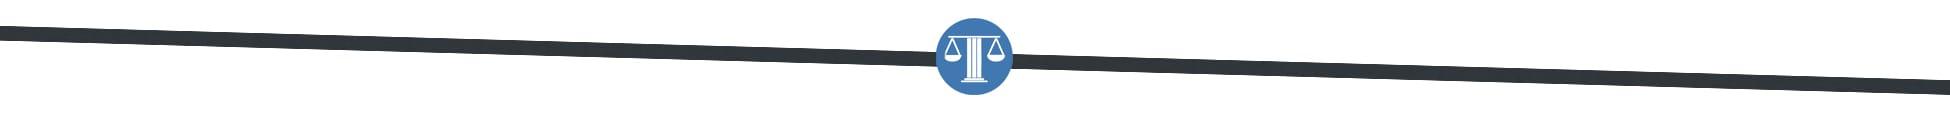 Dr. Brauer Rechtsanwälte Seperator